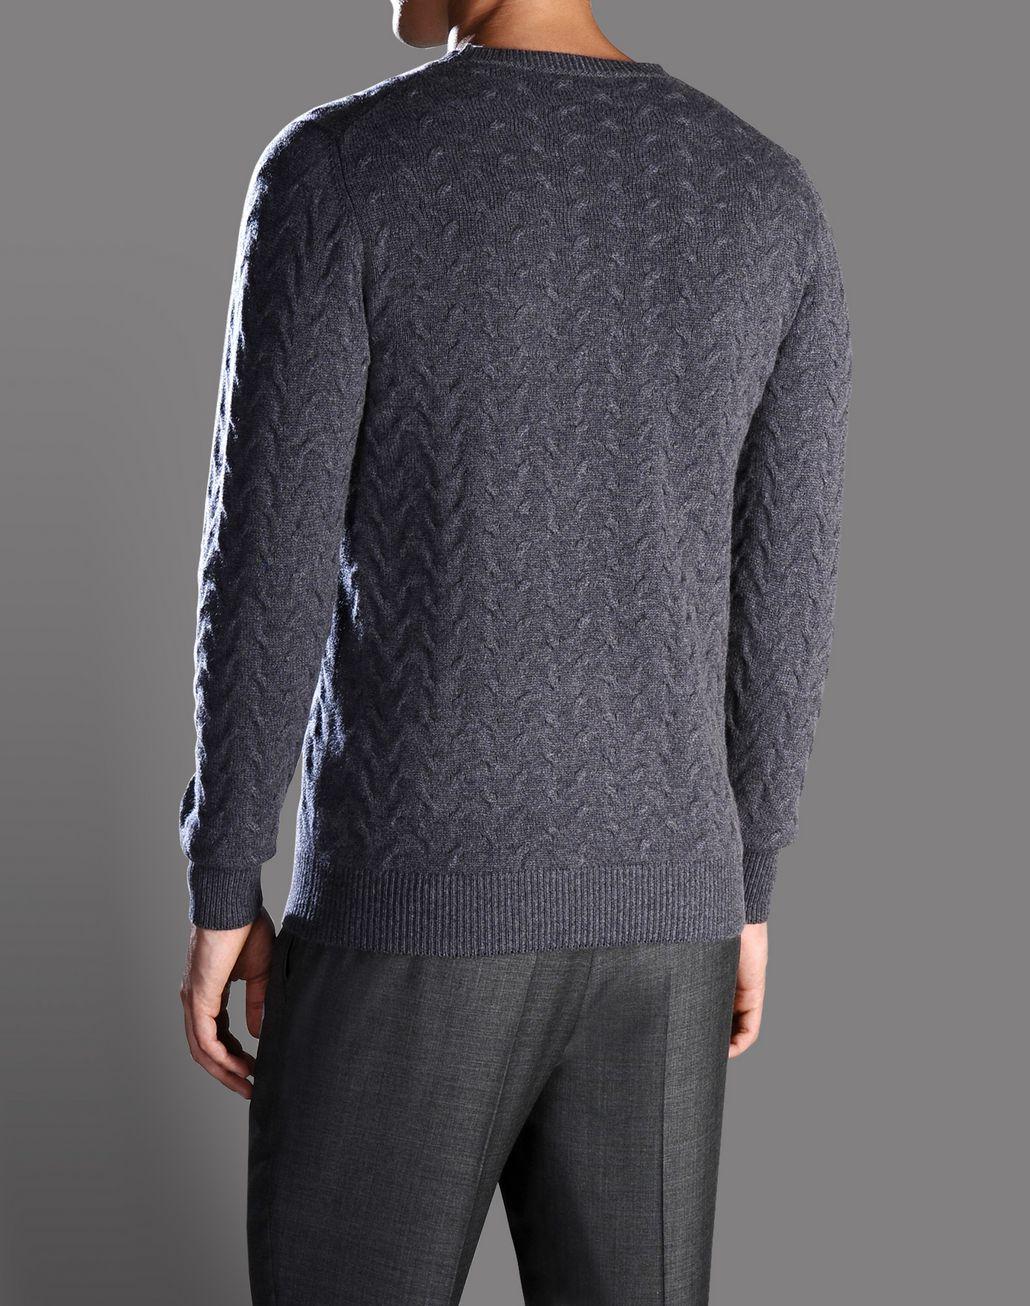 BRIONI cable knit cashmere jumper Knitwear U r